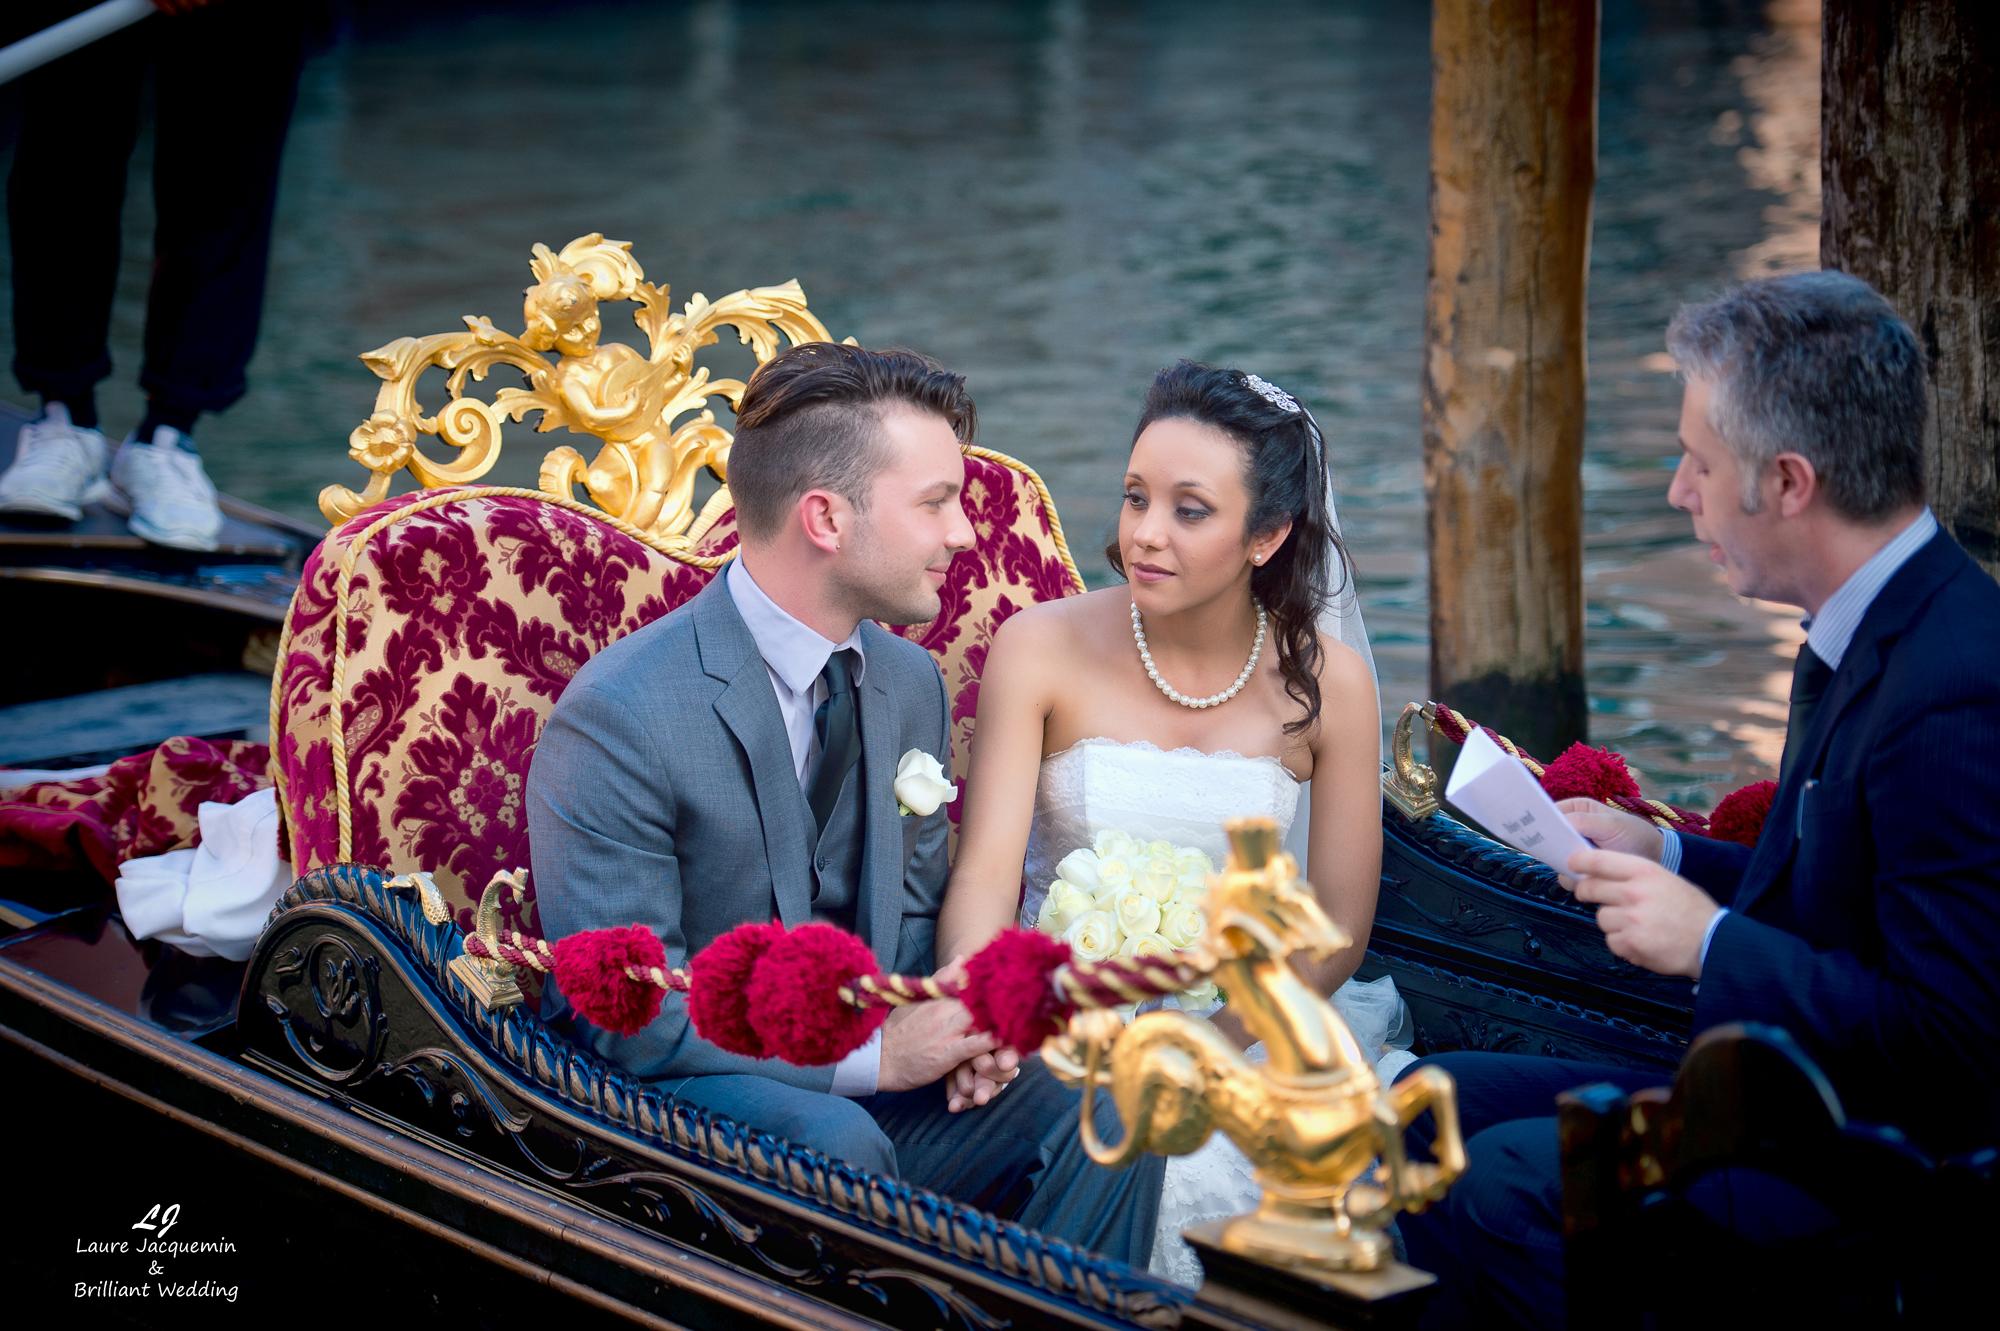 Venice Simbolic Wedding gondola venice Italy laure jacquemin photography (31) copia